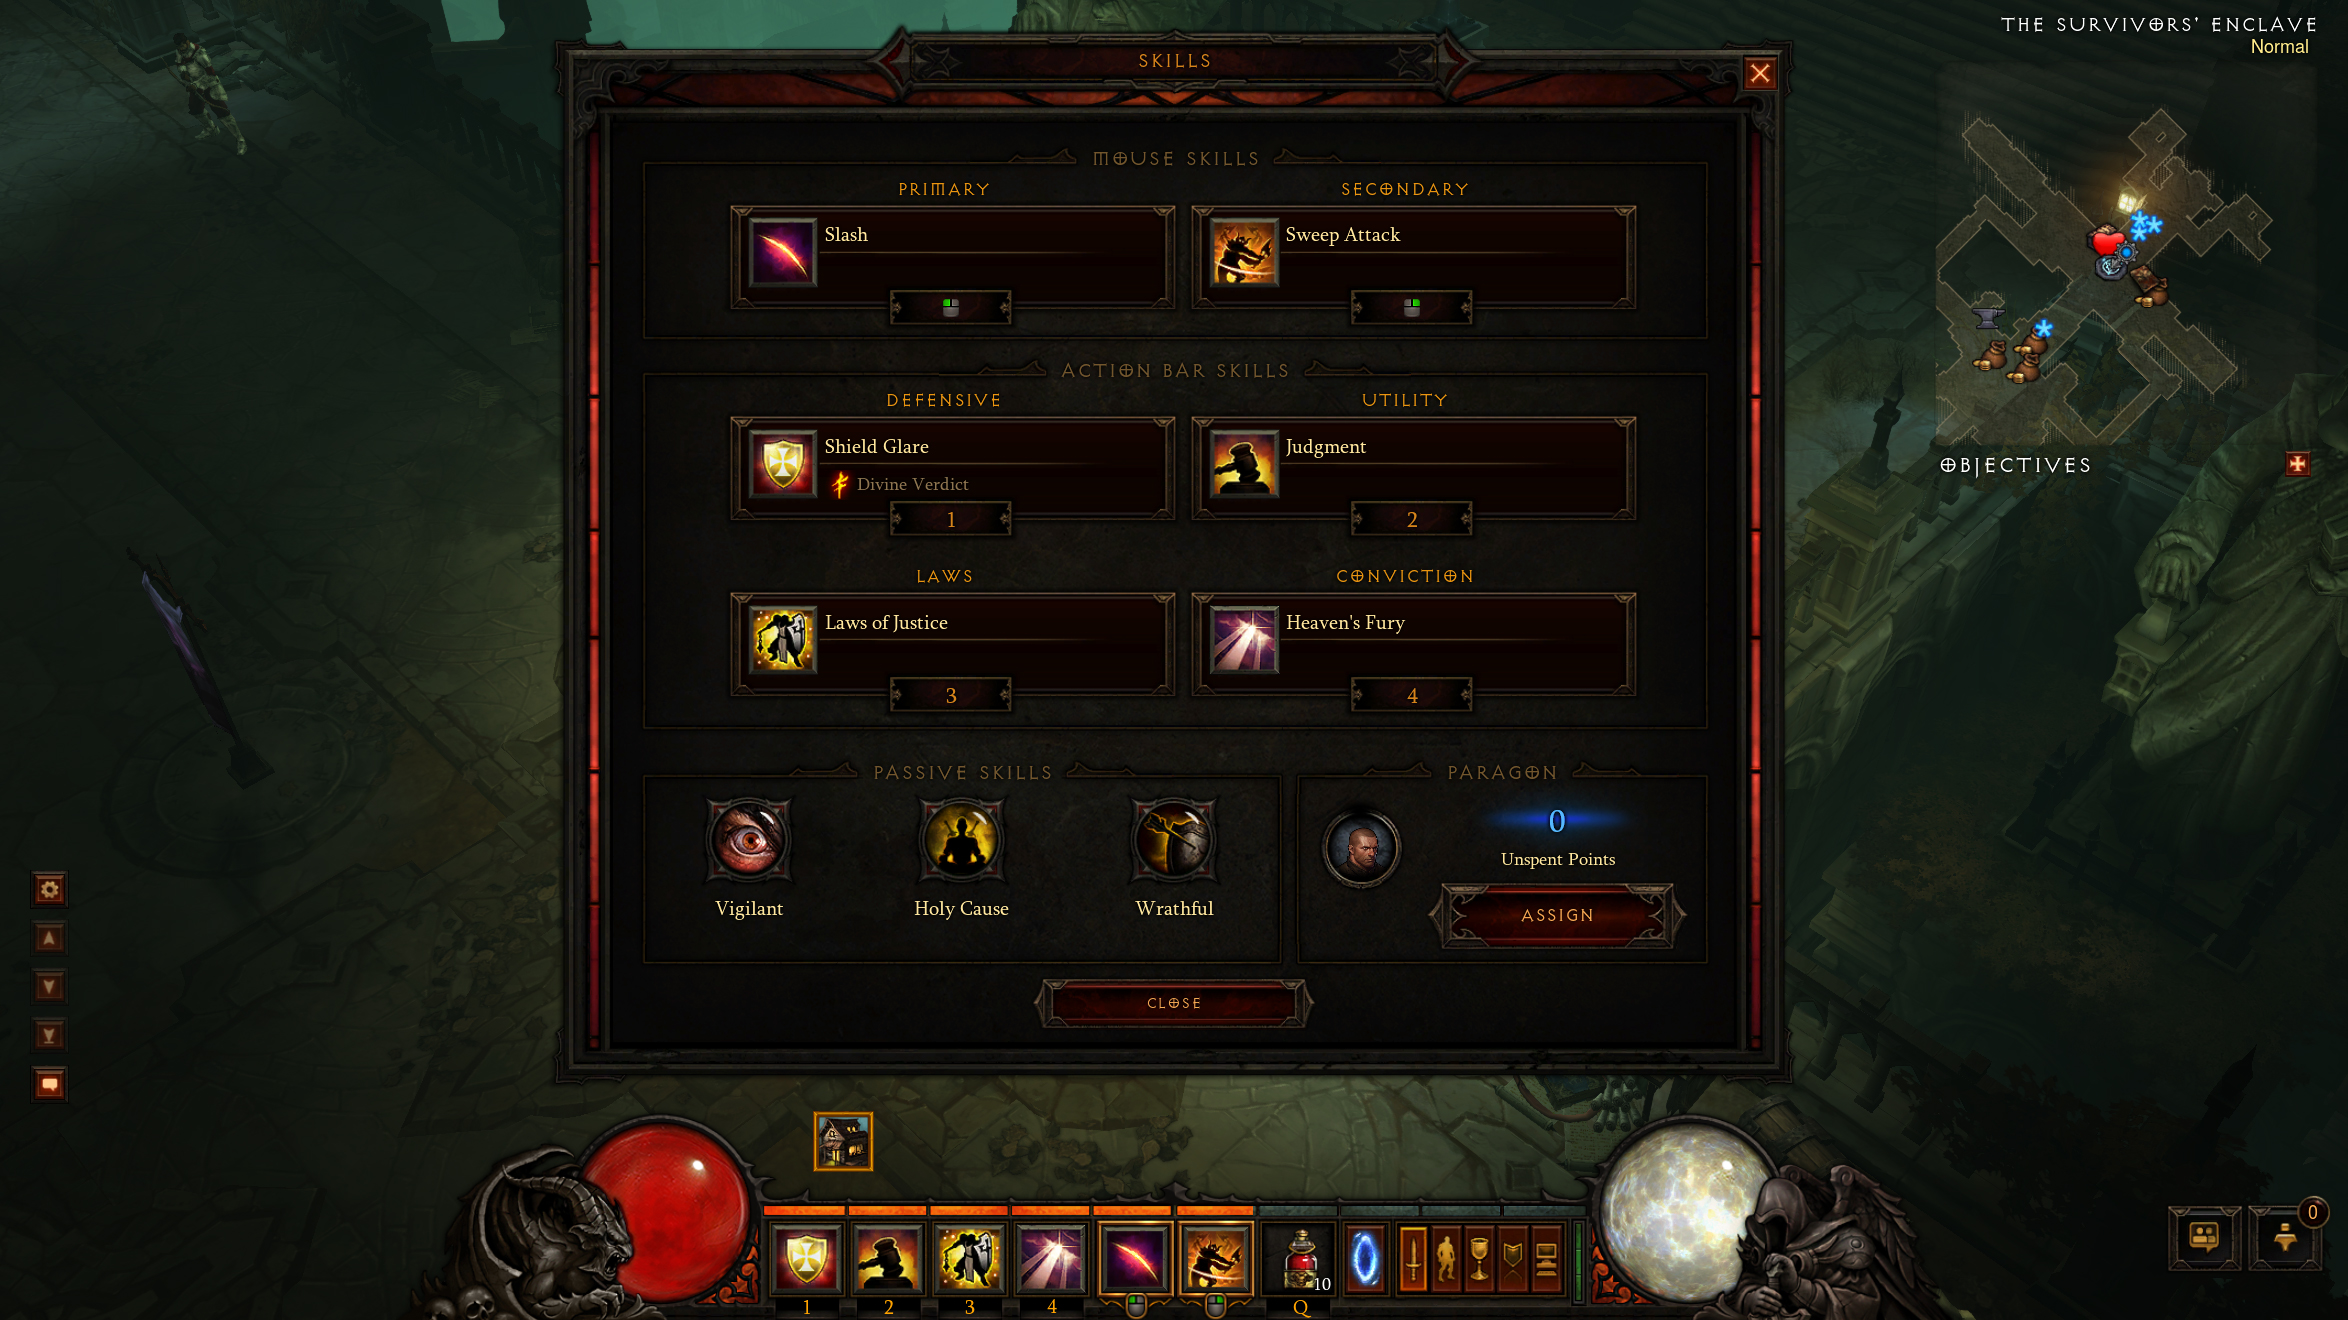 Reaper of souls nouvelle extension de Diablo III 662527815